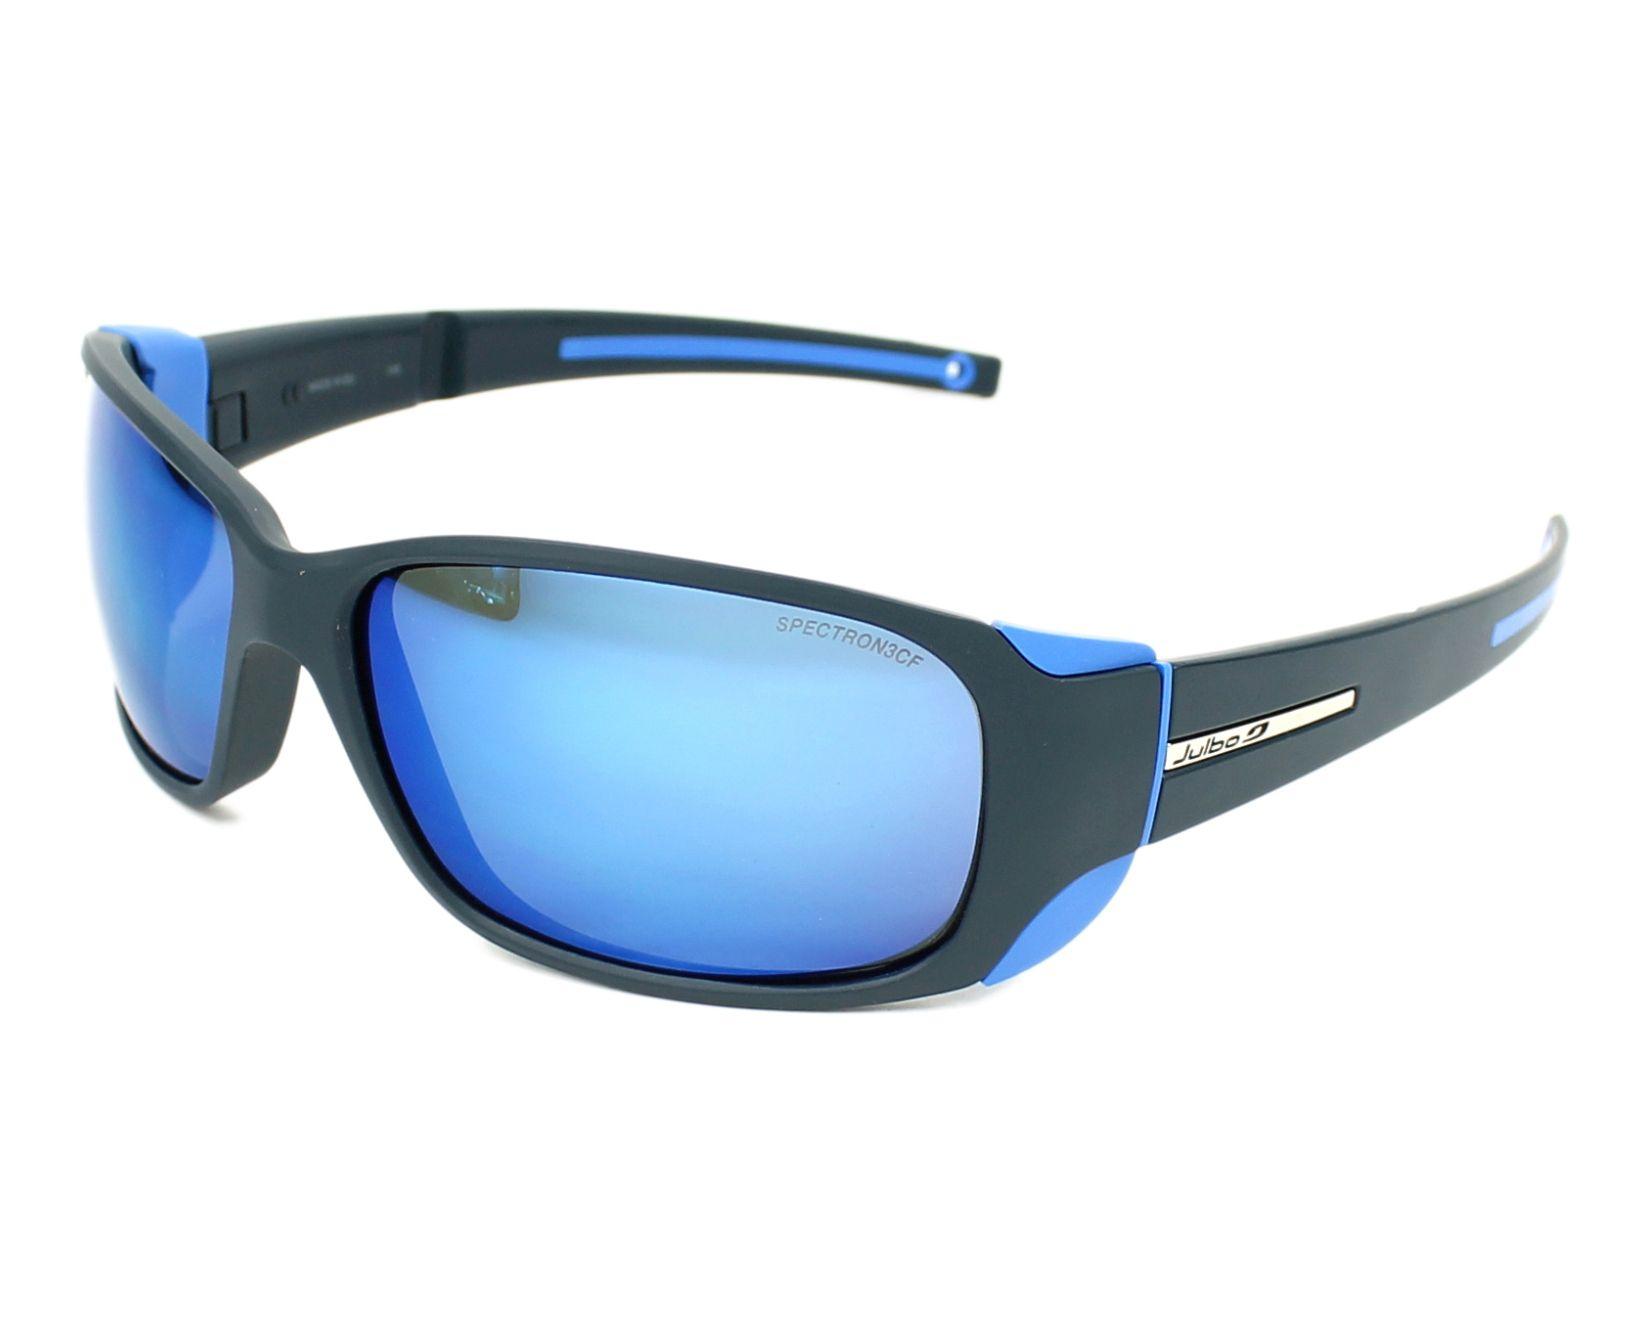 lunettes de soleil julbo j415 1112 bleu avec des verres gris. Black Bedroom Furniture Sets. Home Design Ideas